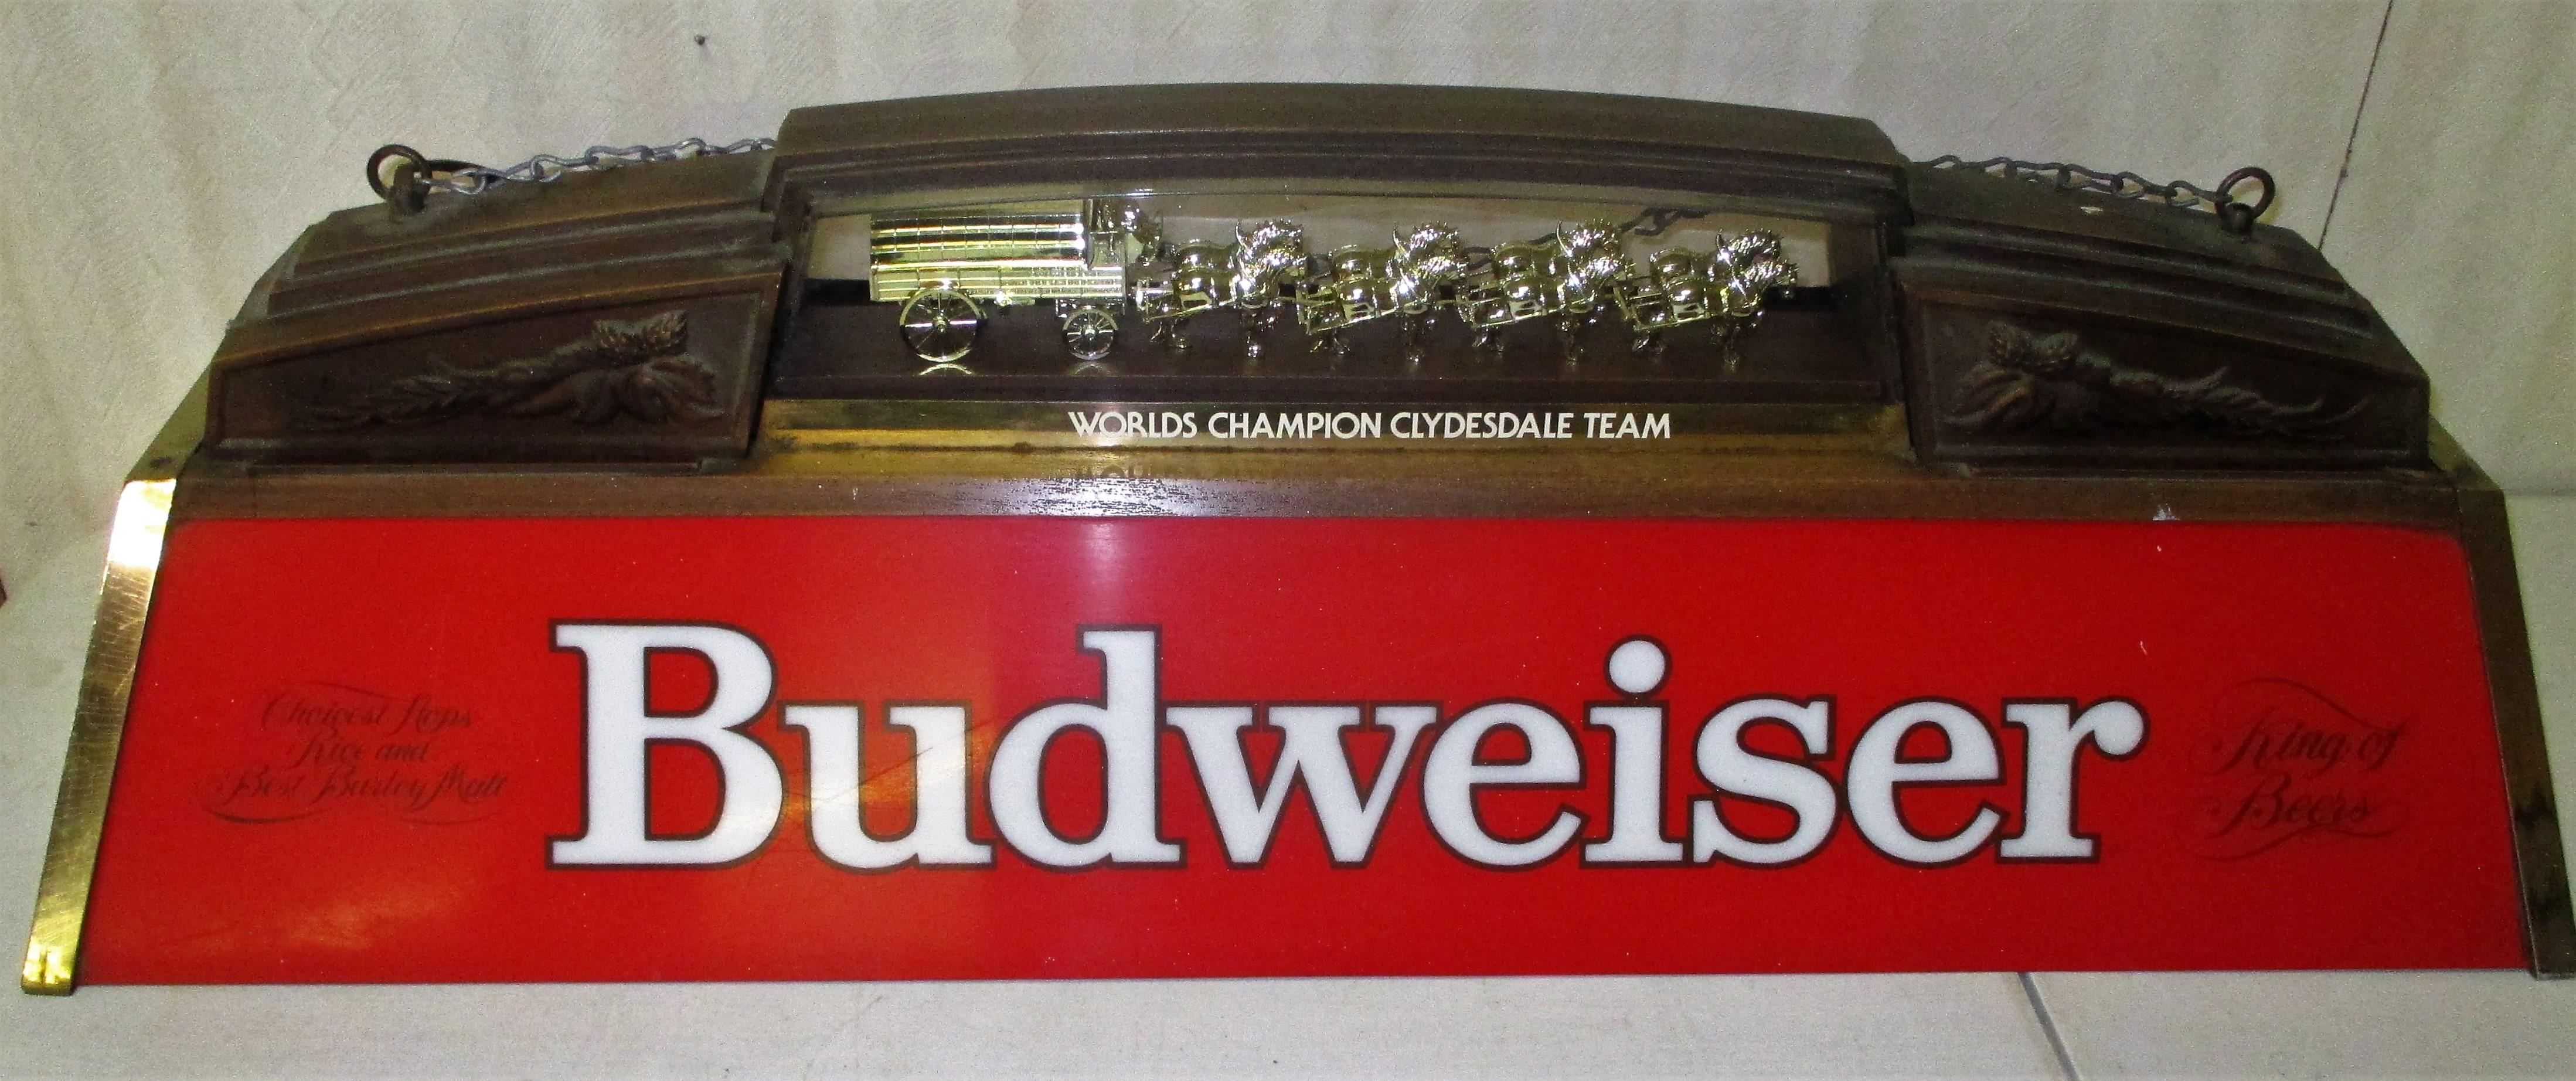 103: Budweiser Pool Table Light